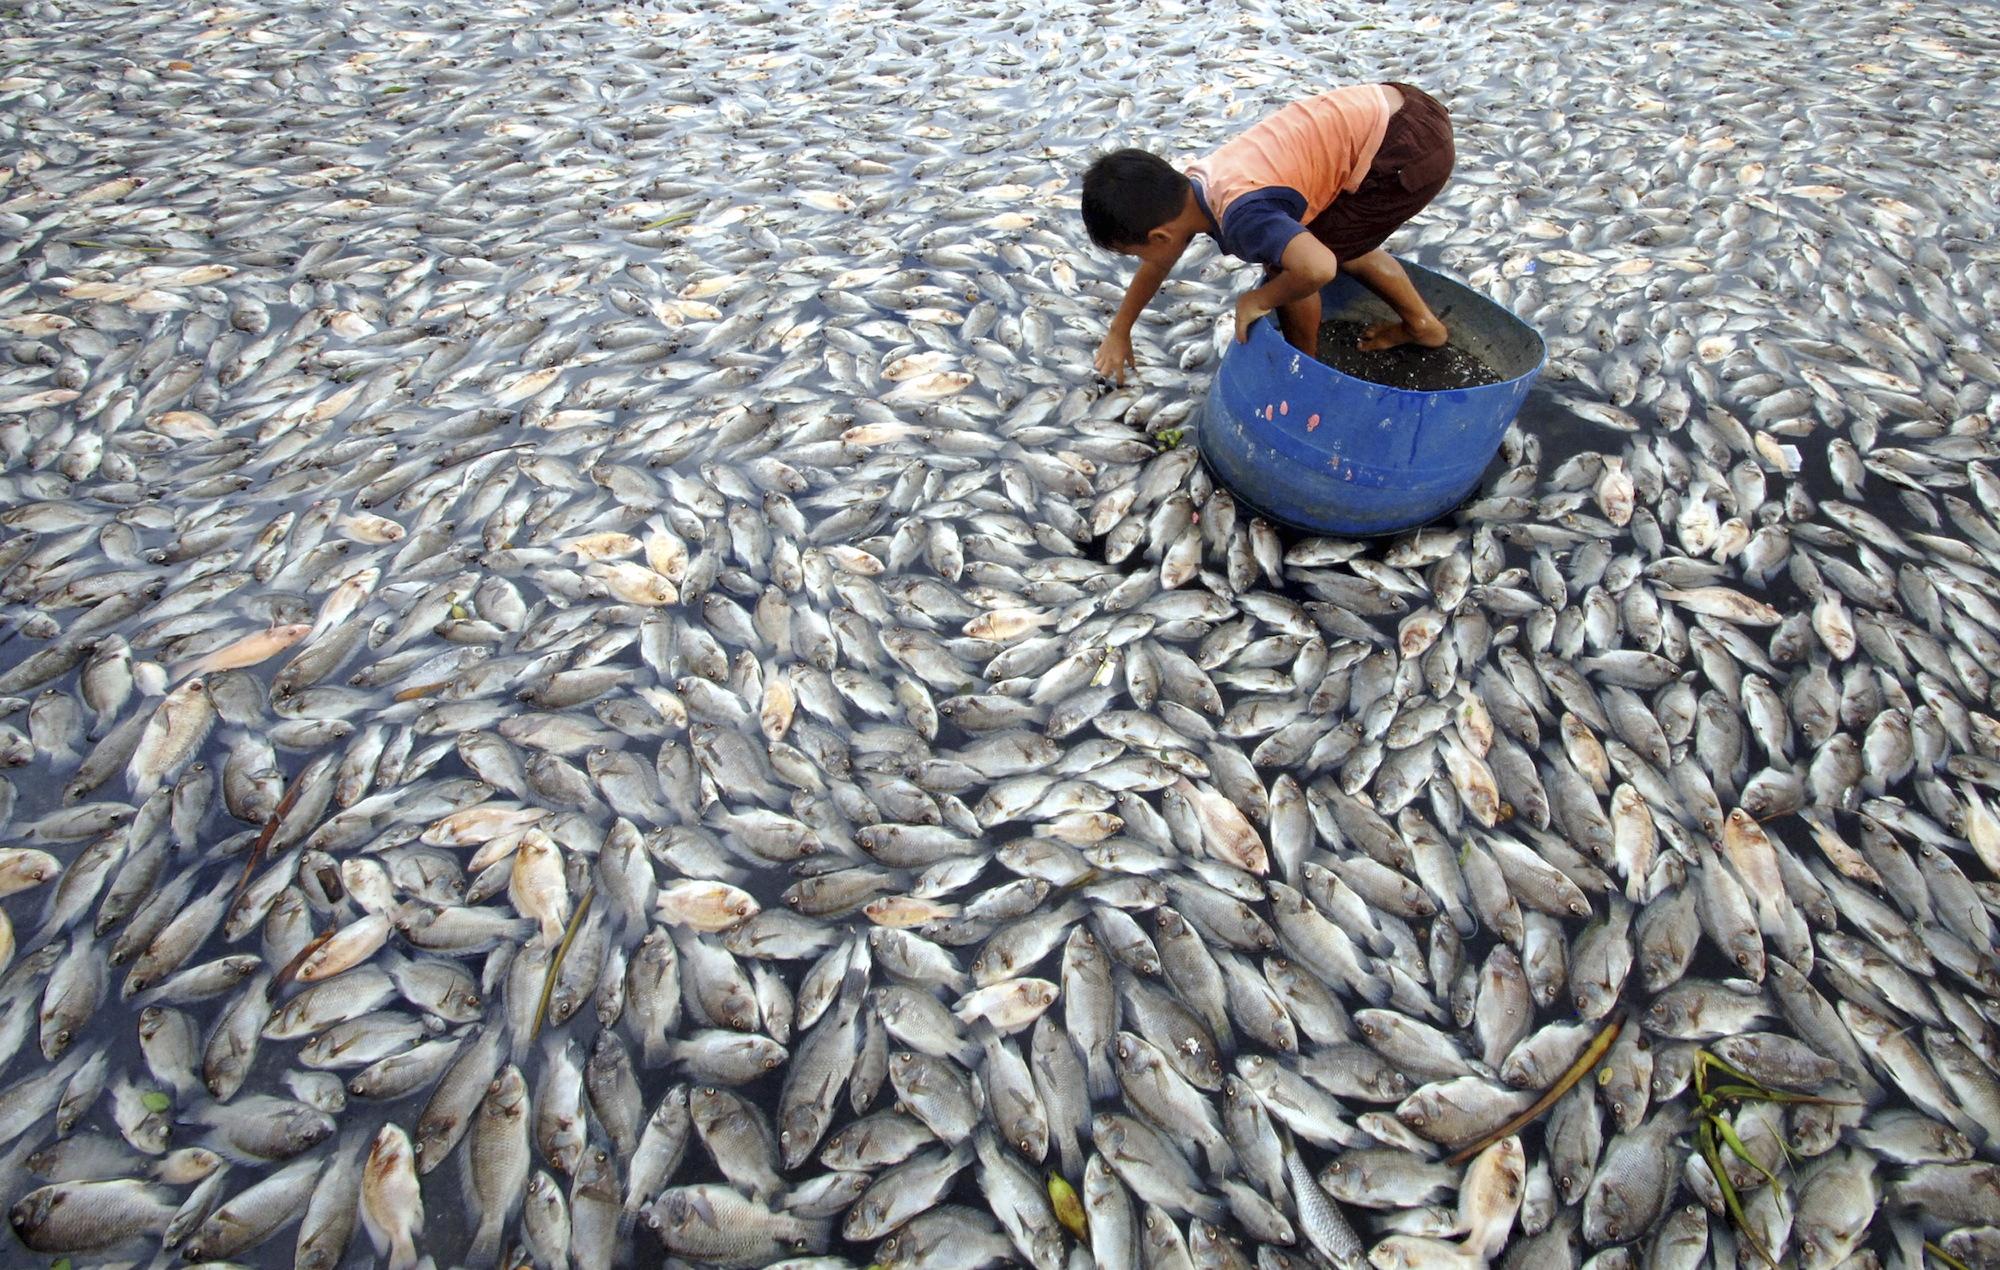 Dead fish farm